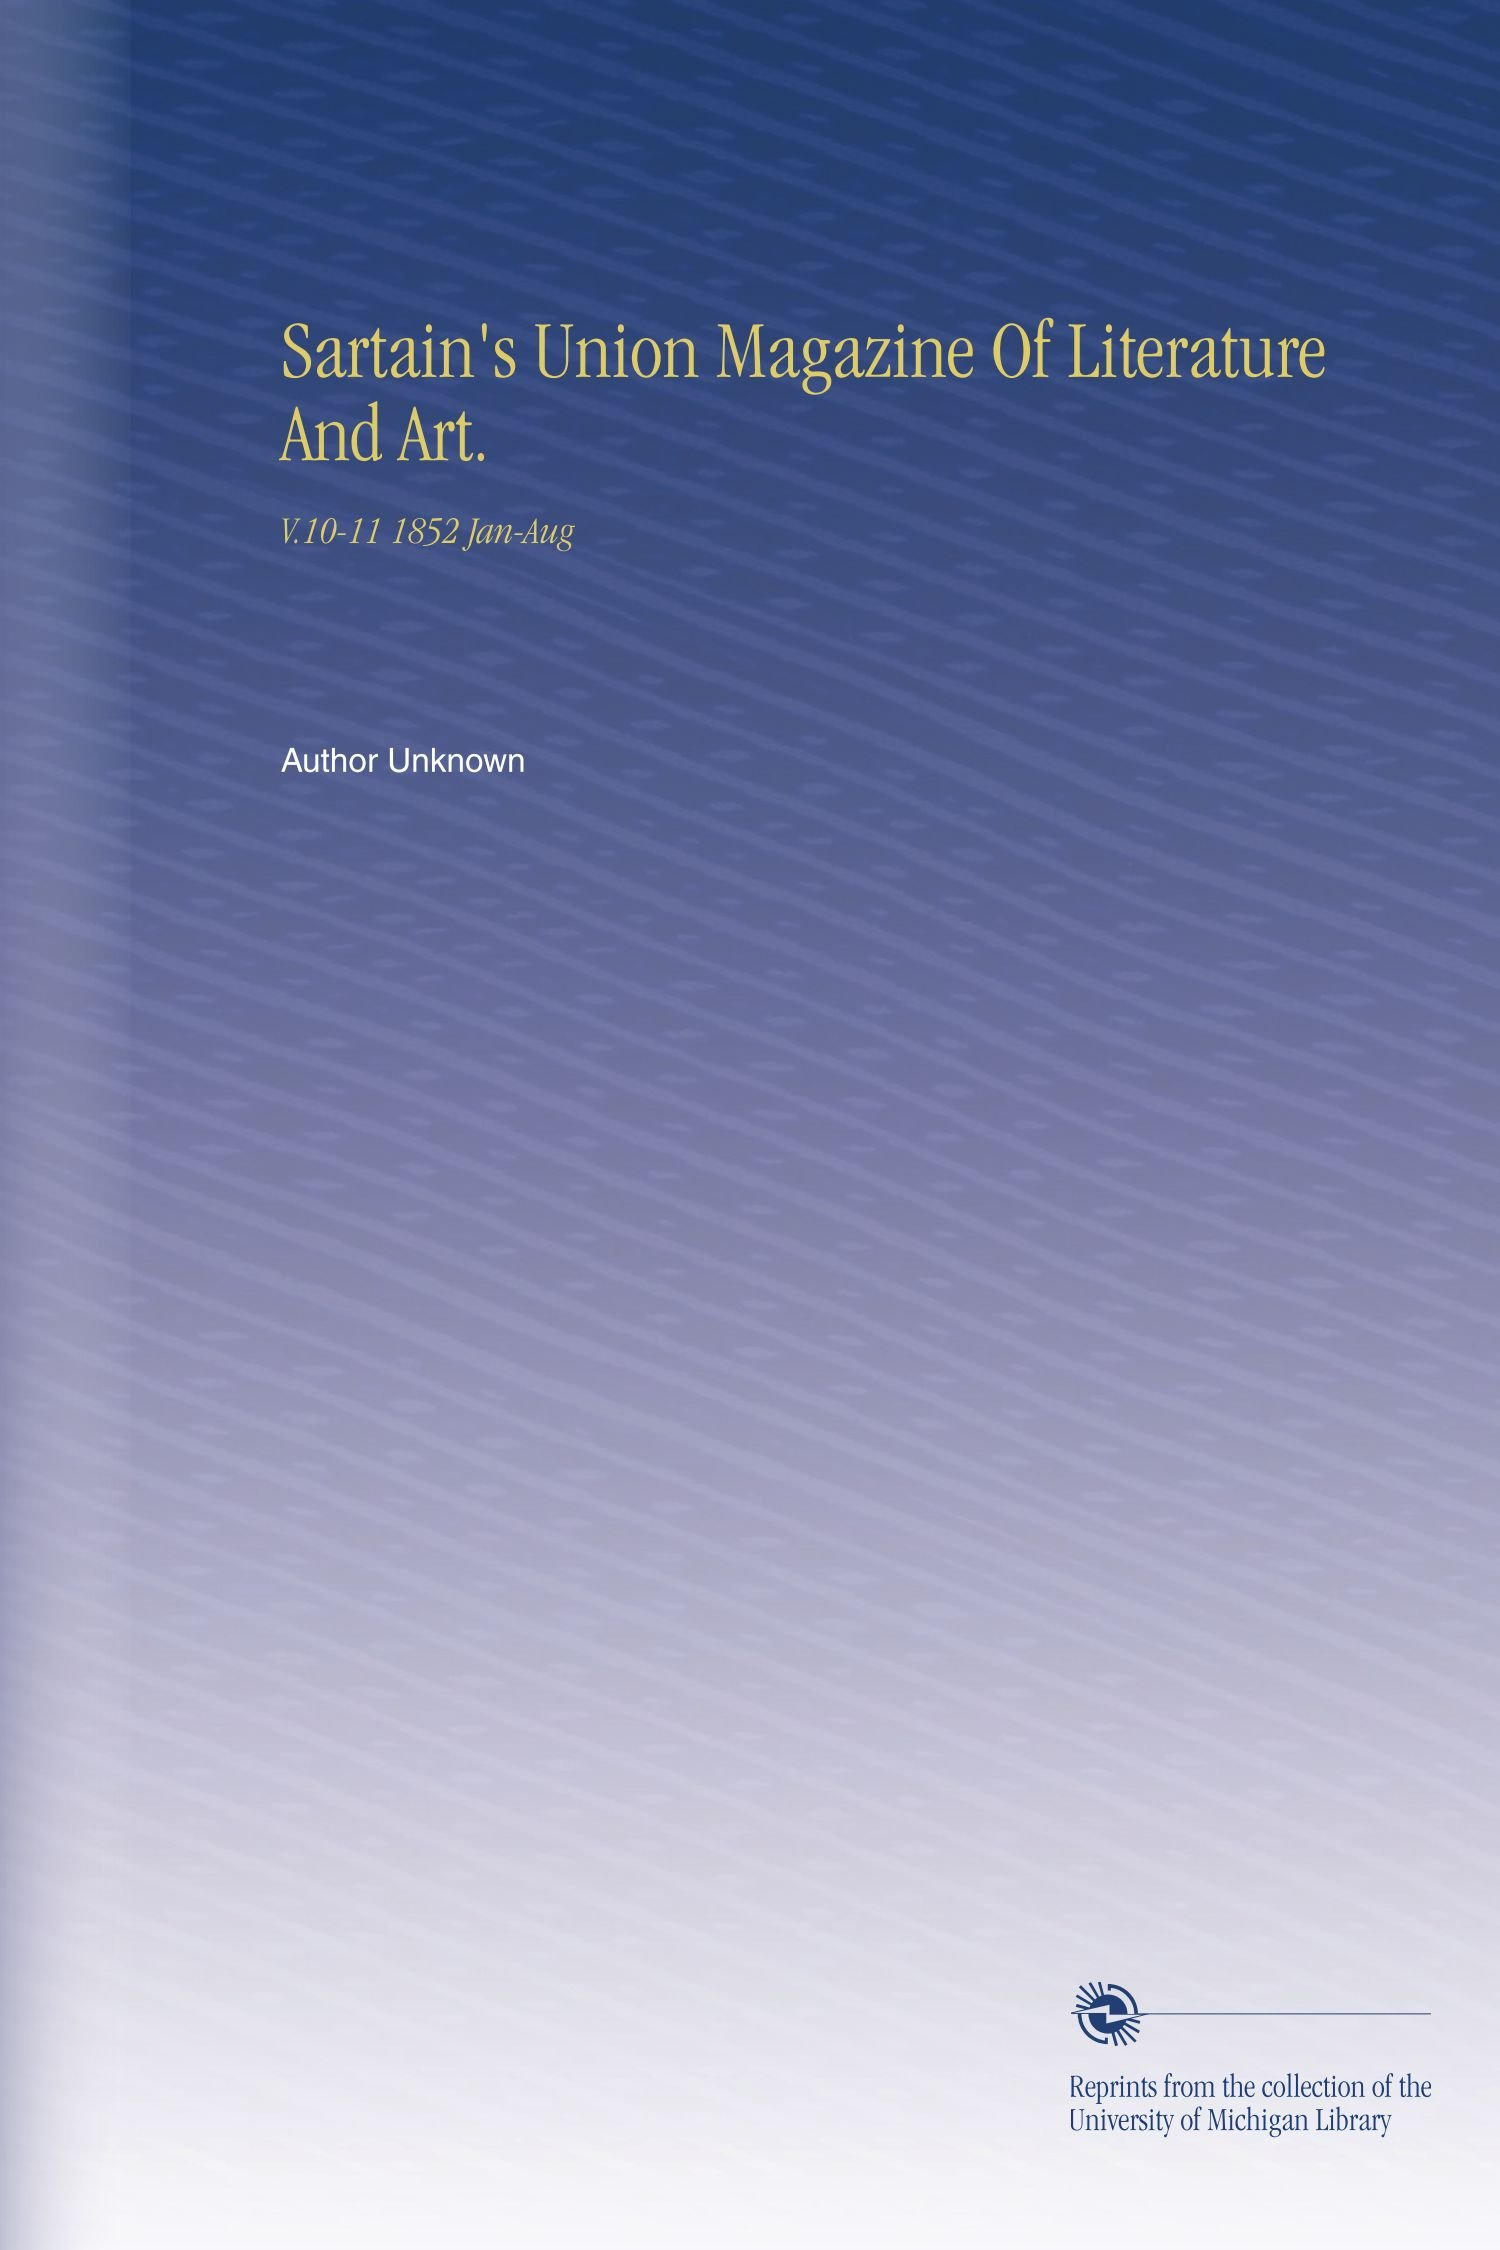 Download Sartain's Union Magazine Of Literature And Art.: V.10-11 1852 Jan-Aug pdf epub